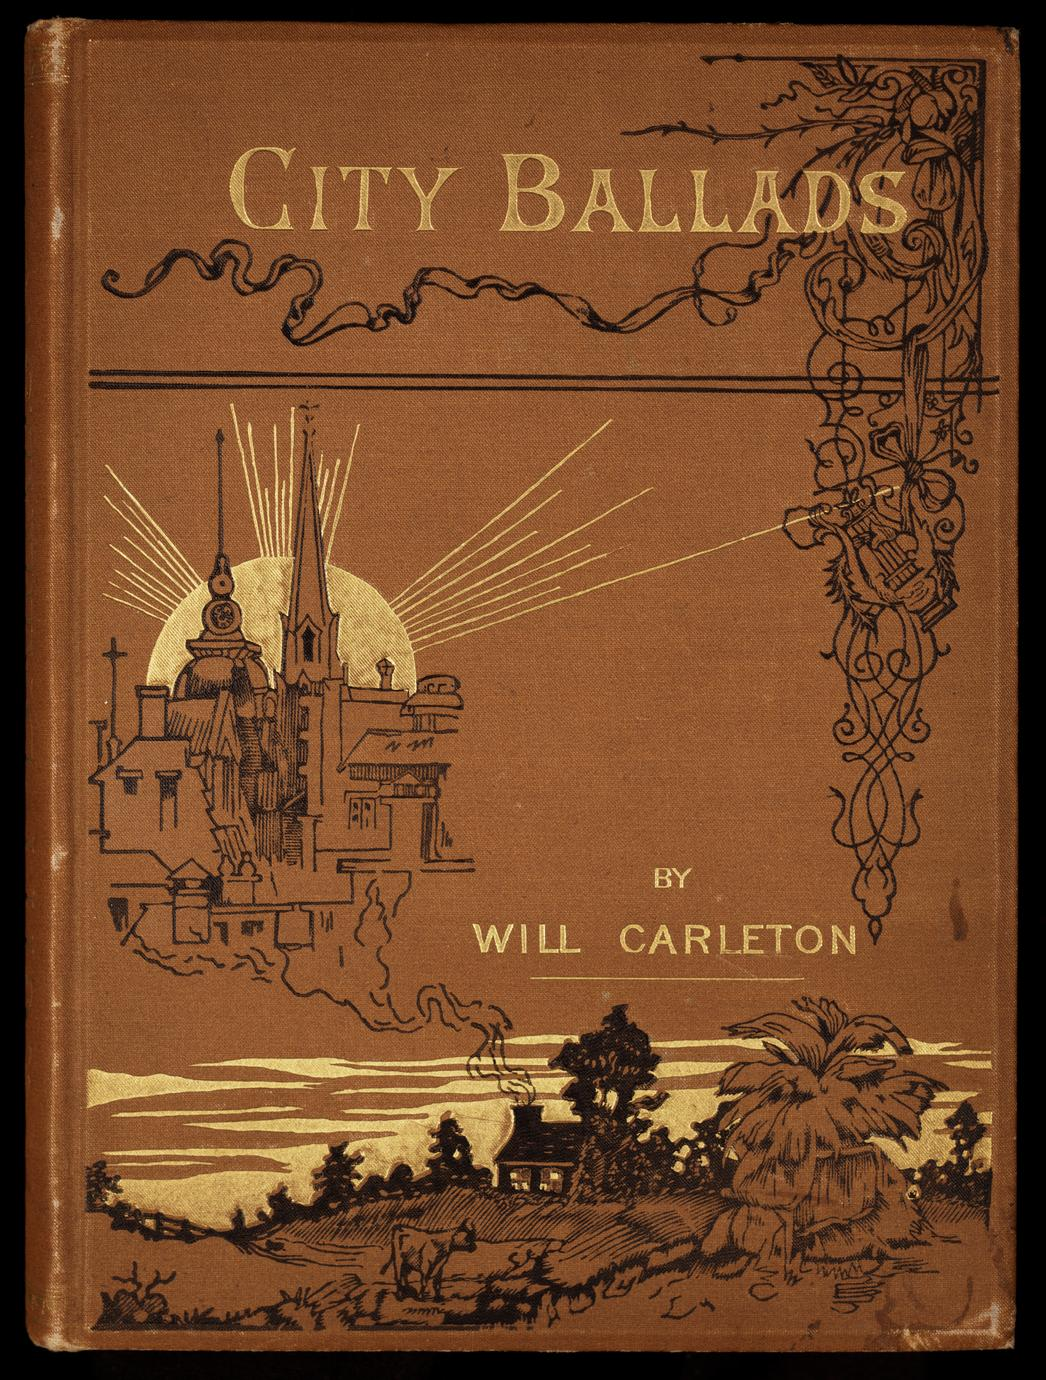 City ballads (1 of 3)